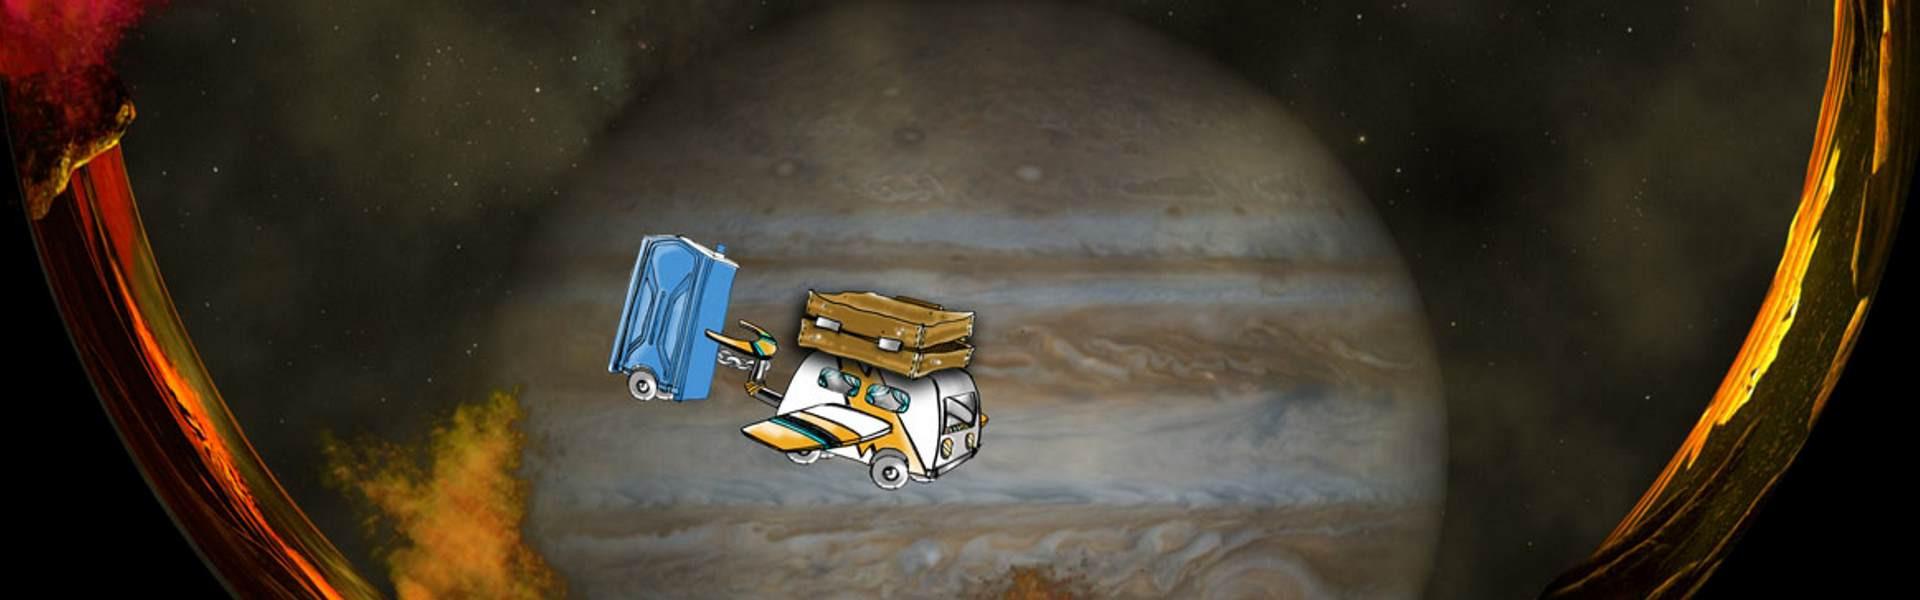 Abenteuer Planeten